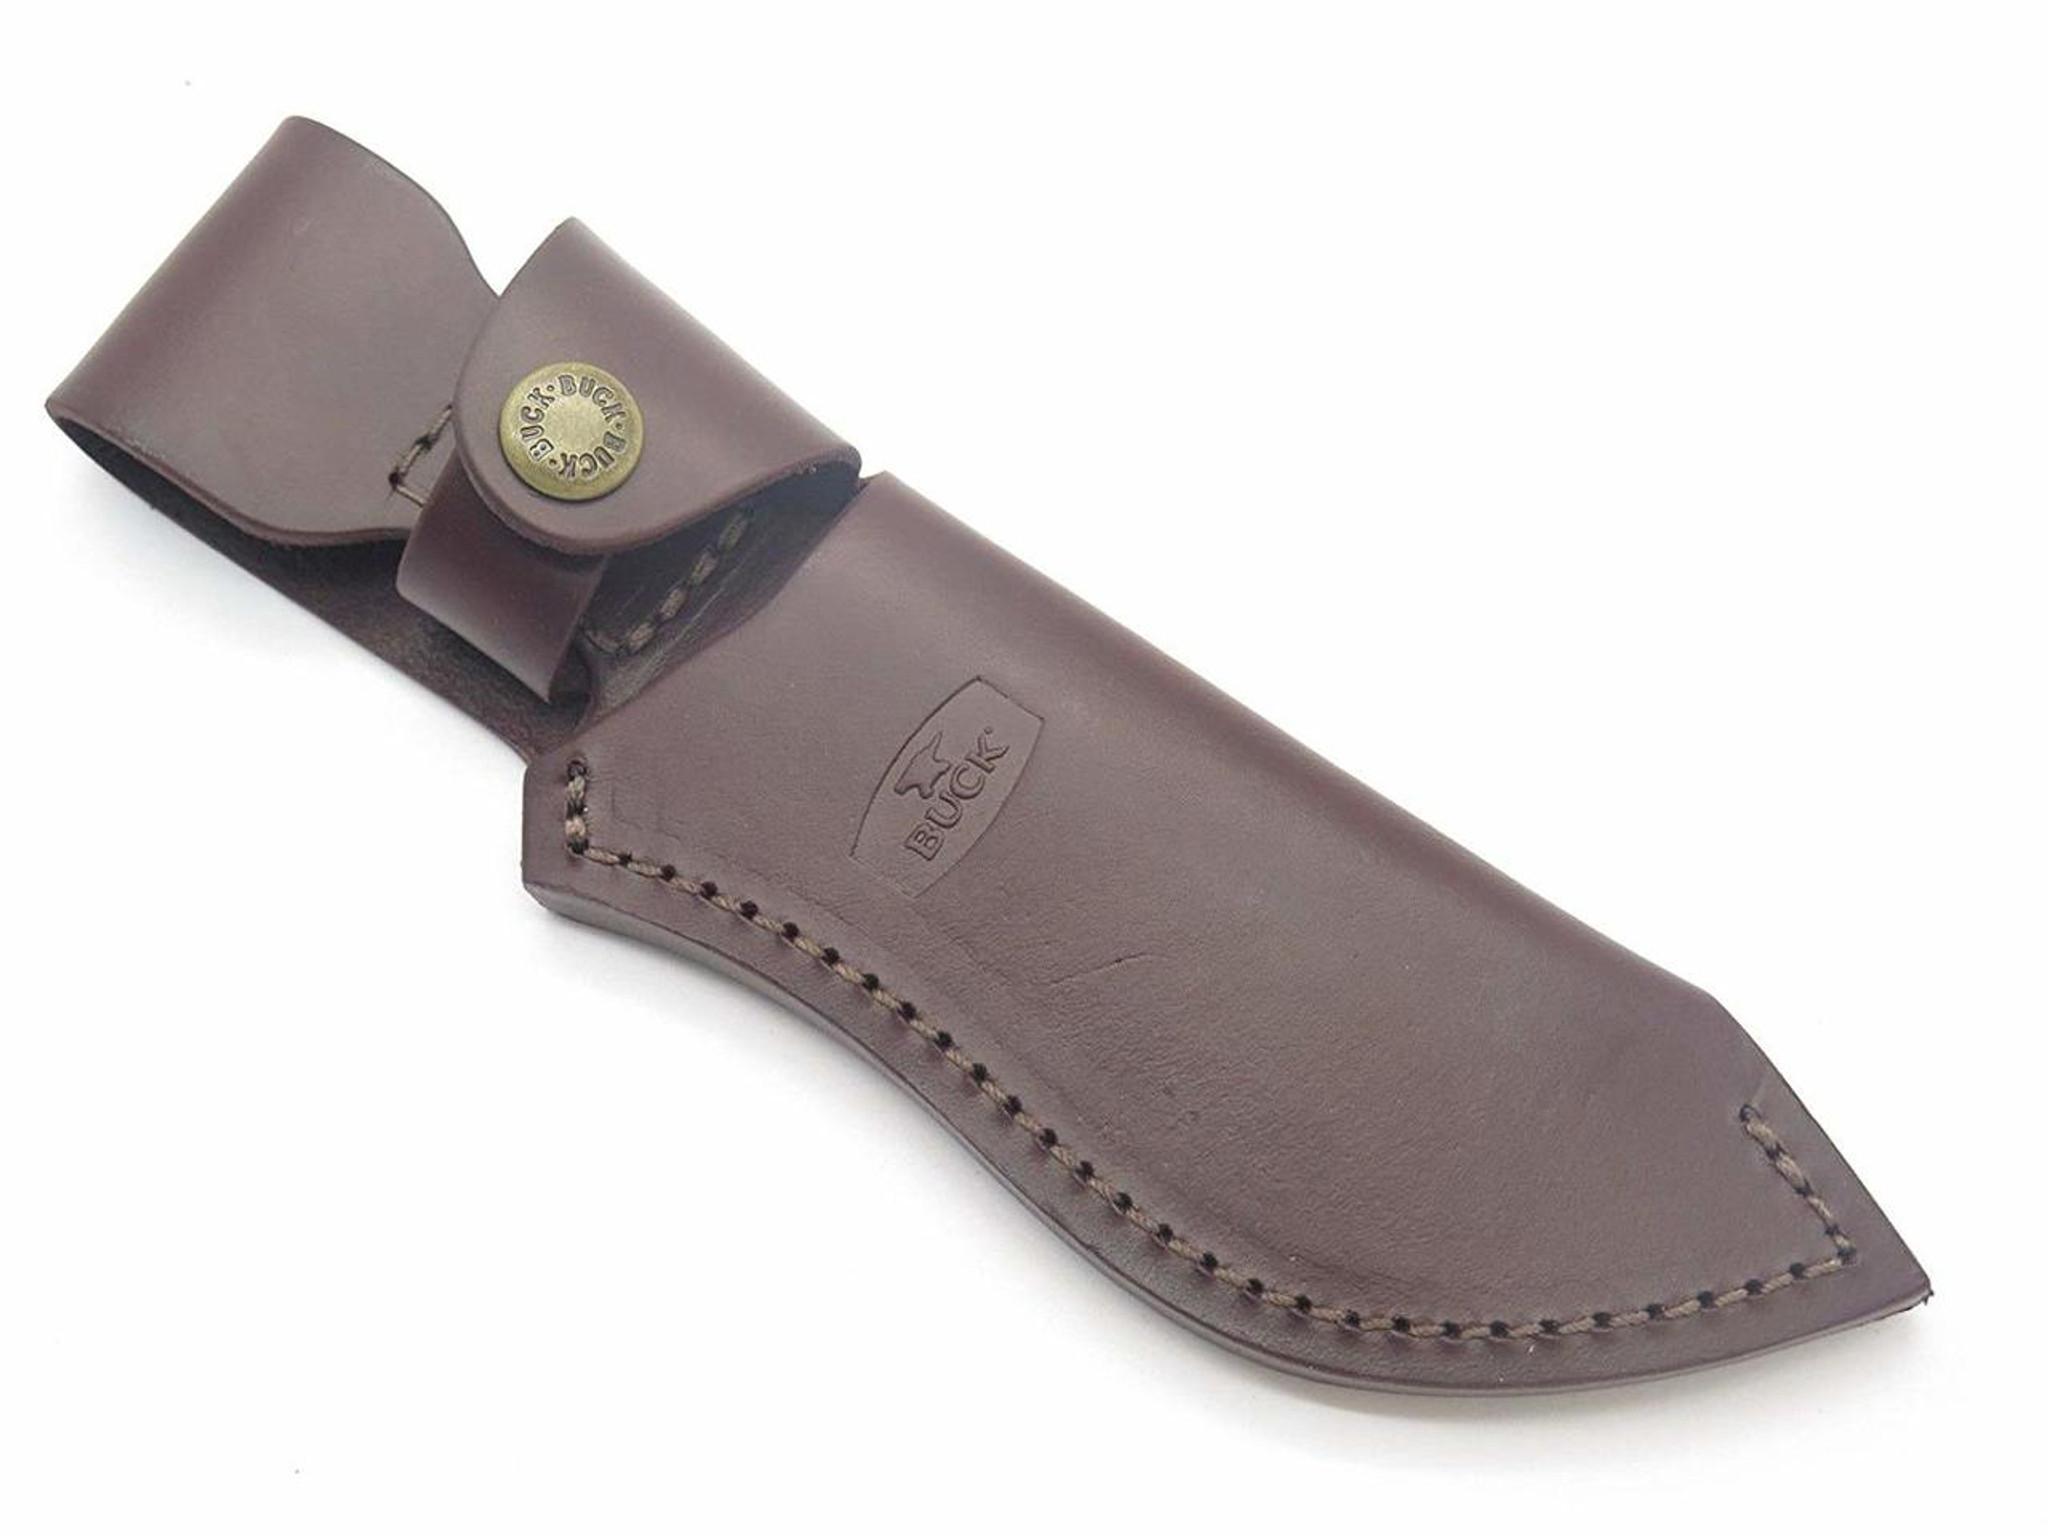 Buck 488 087 085 Ergo Hunter Pro Burgundy Leather Fixed Blade Knife Sheath Eprague Llc